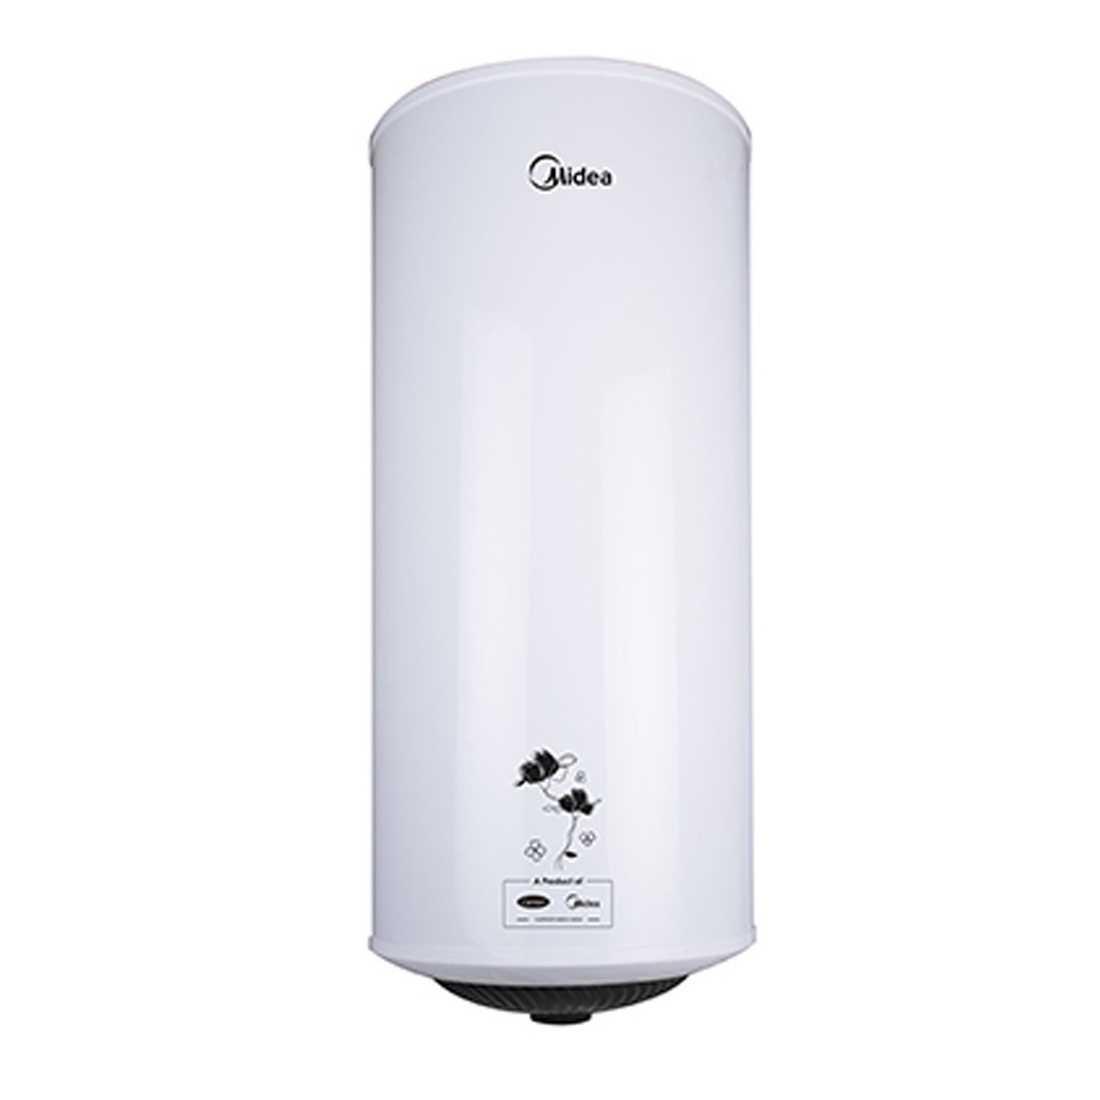 Midea MWHSA354VK 35 Litre Storage Water Heater